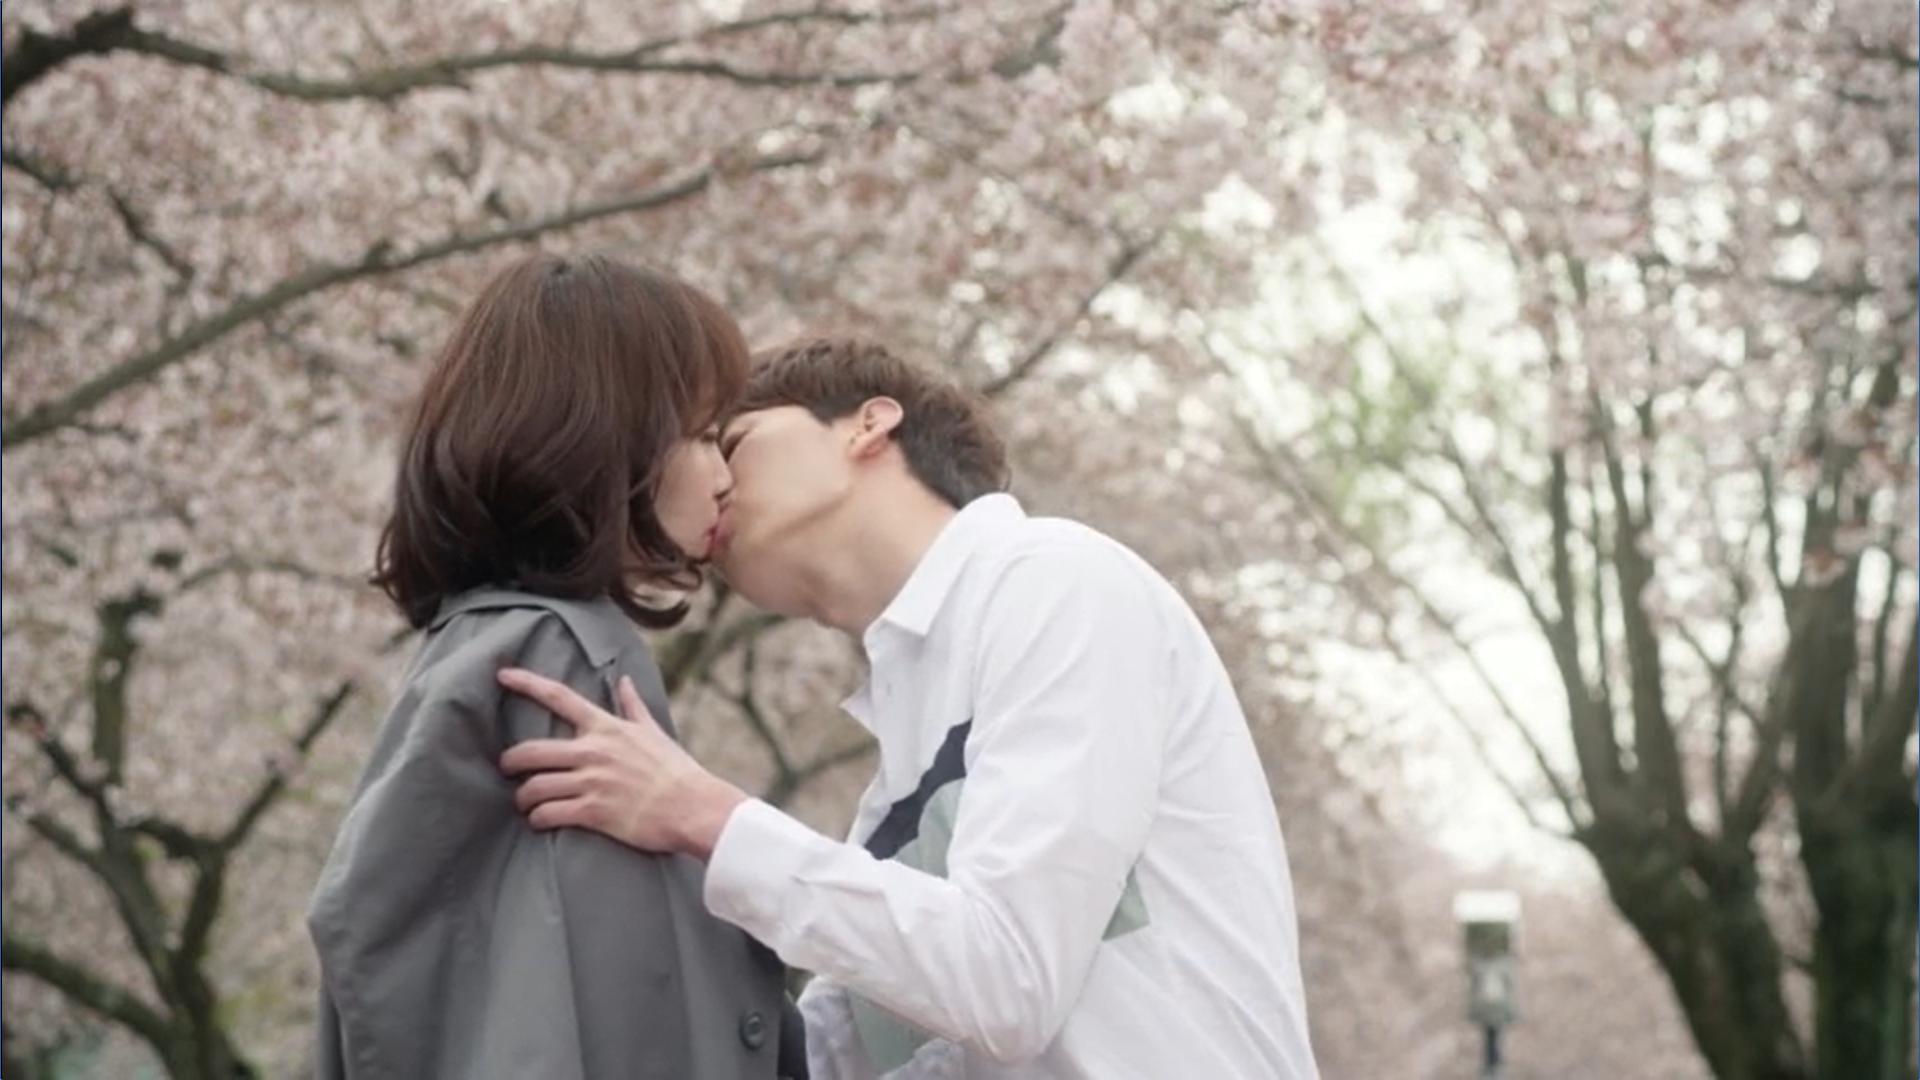 Wednesday 3:30 PM Seon Eun-woo and Yoon Jae-won kissing cherry blossoms